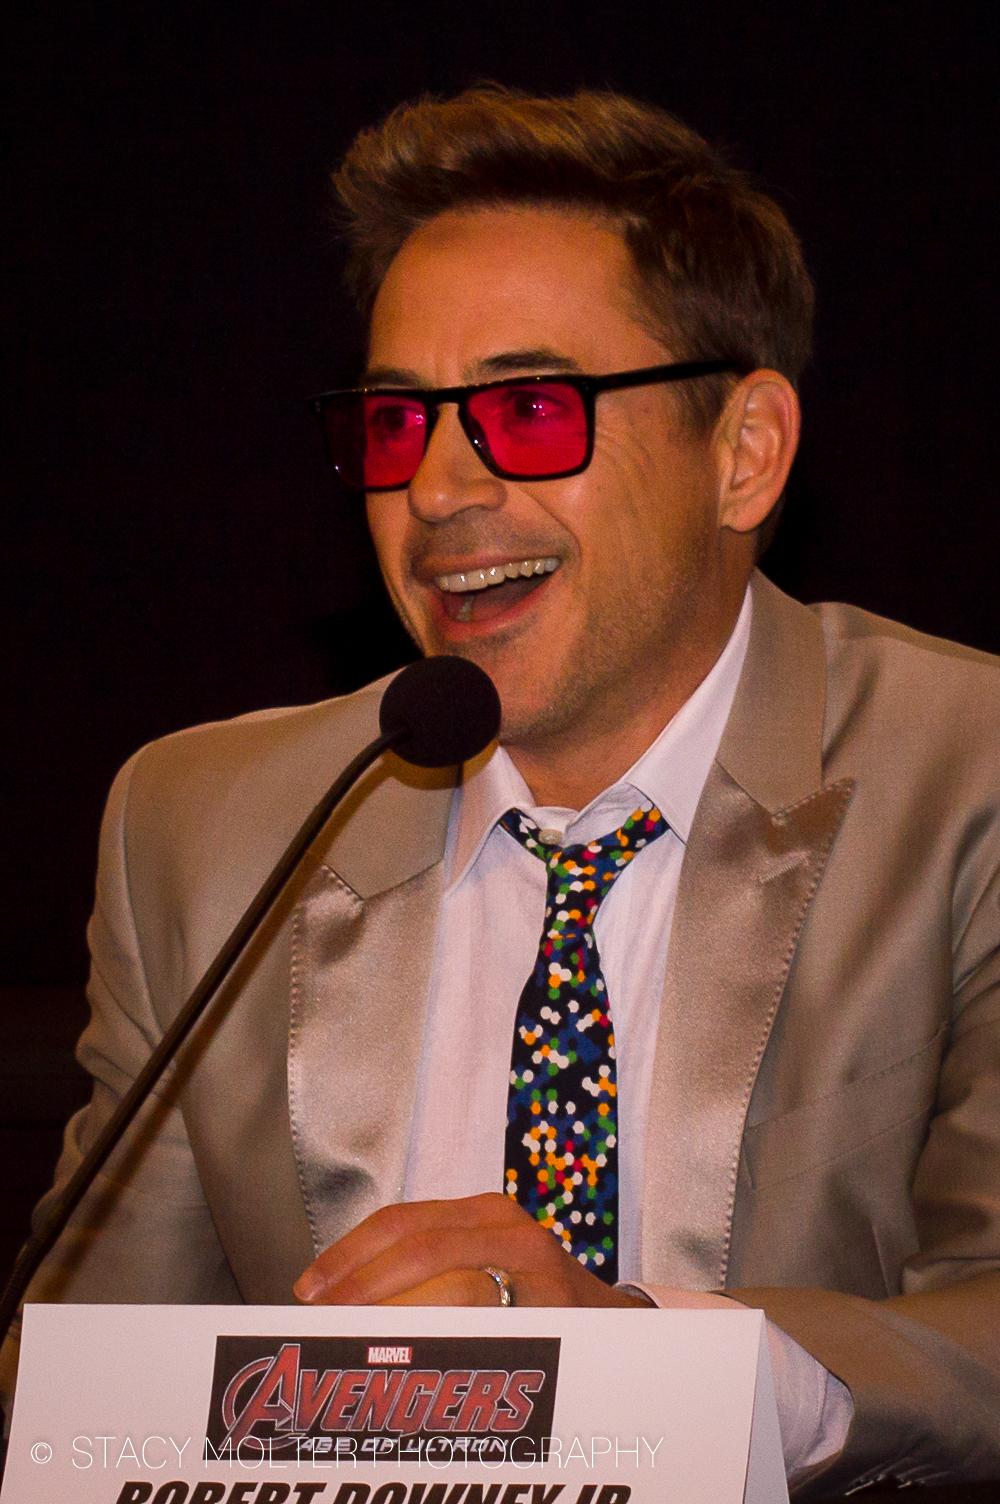 Robert Downey Jr. - Avengers Age of Ultron Press Conference Junket